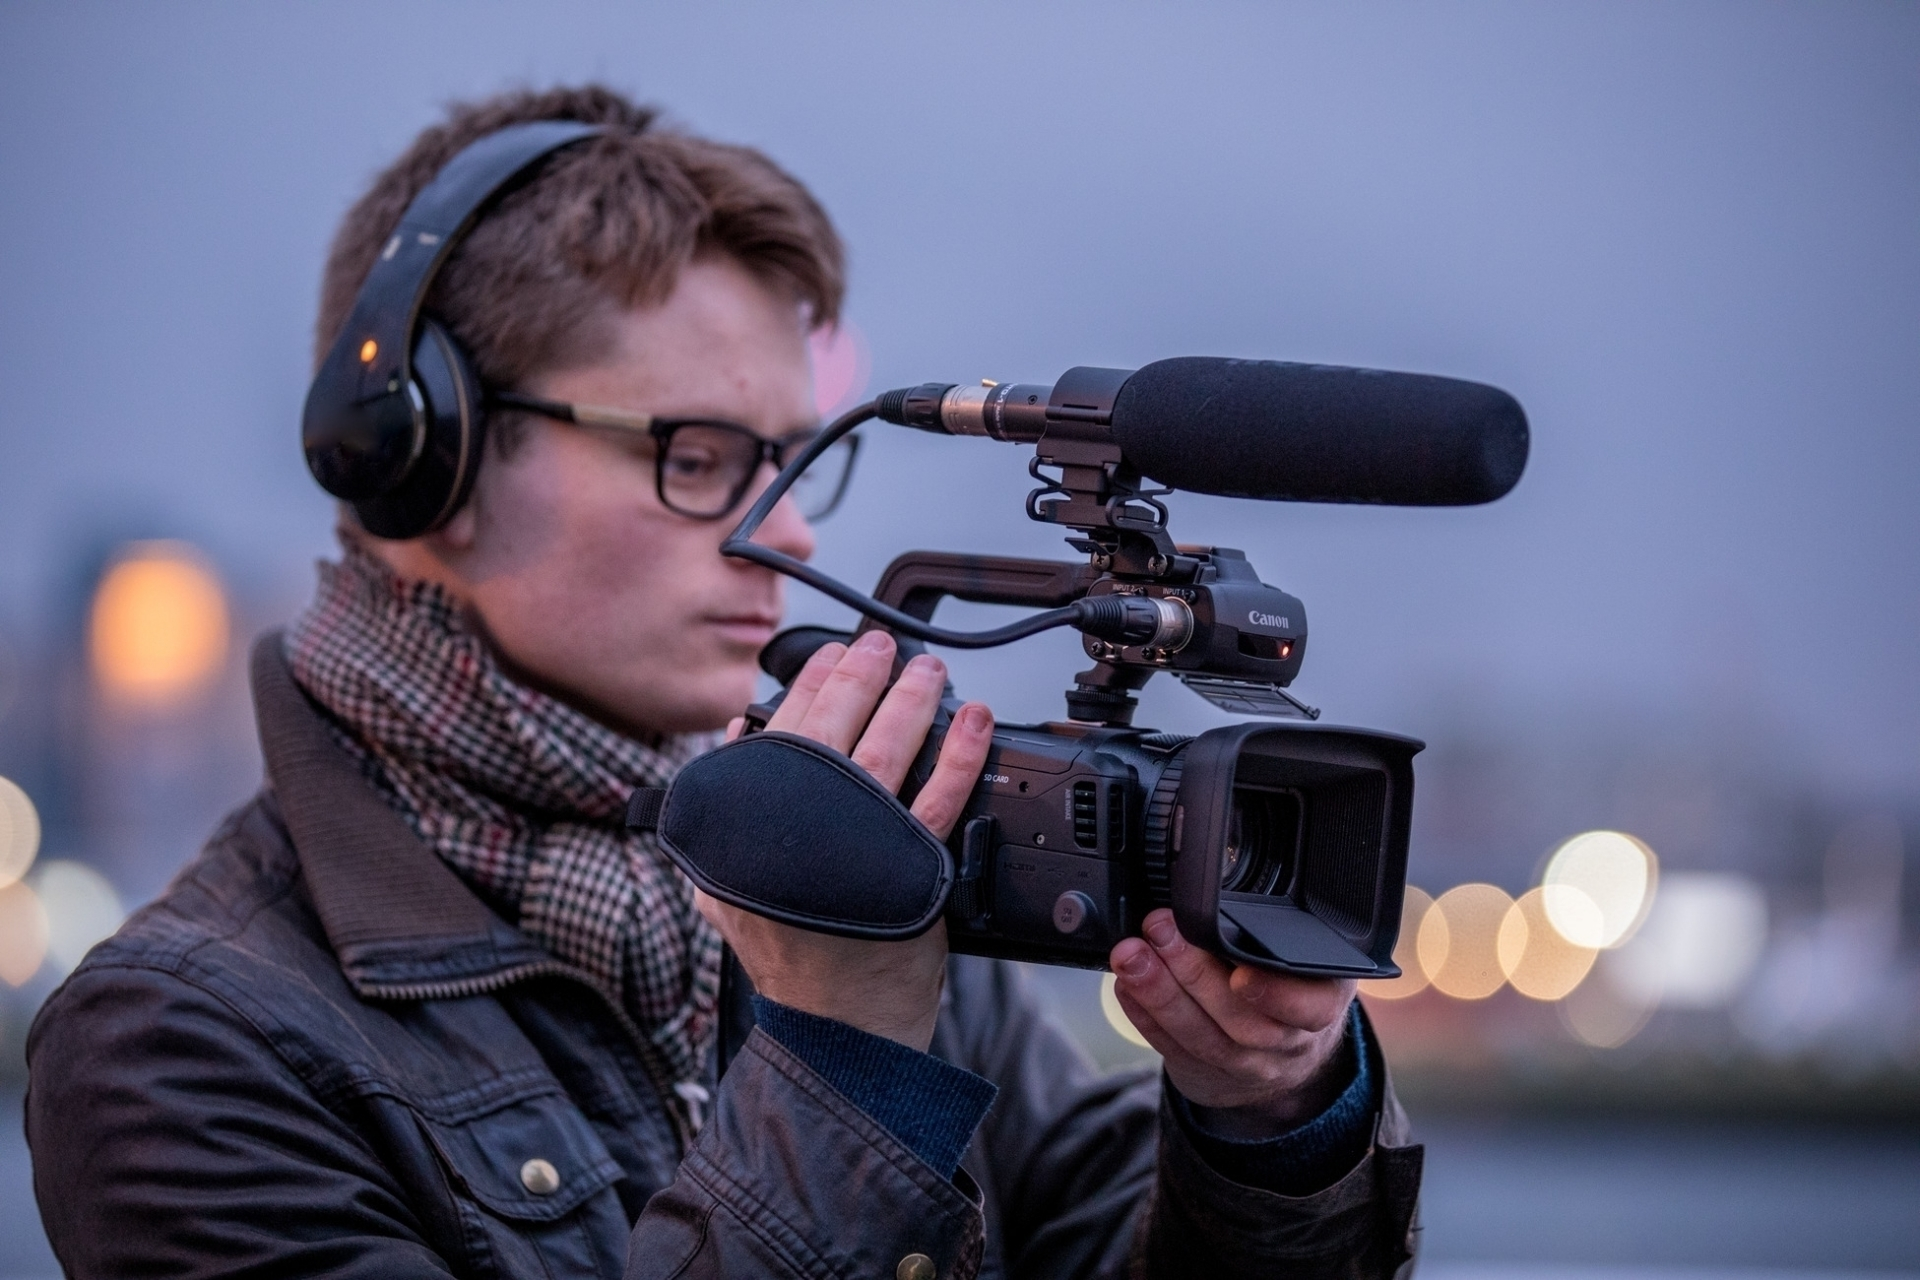 (Pro Video)- Vom Dreh zum fertigen Film 2.0 - Calumet FRA - Canon Academy Spezialthemen